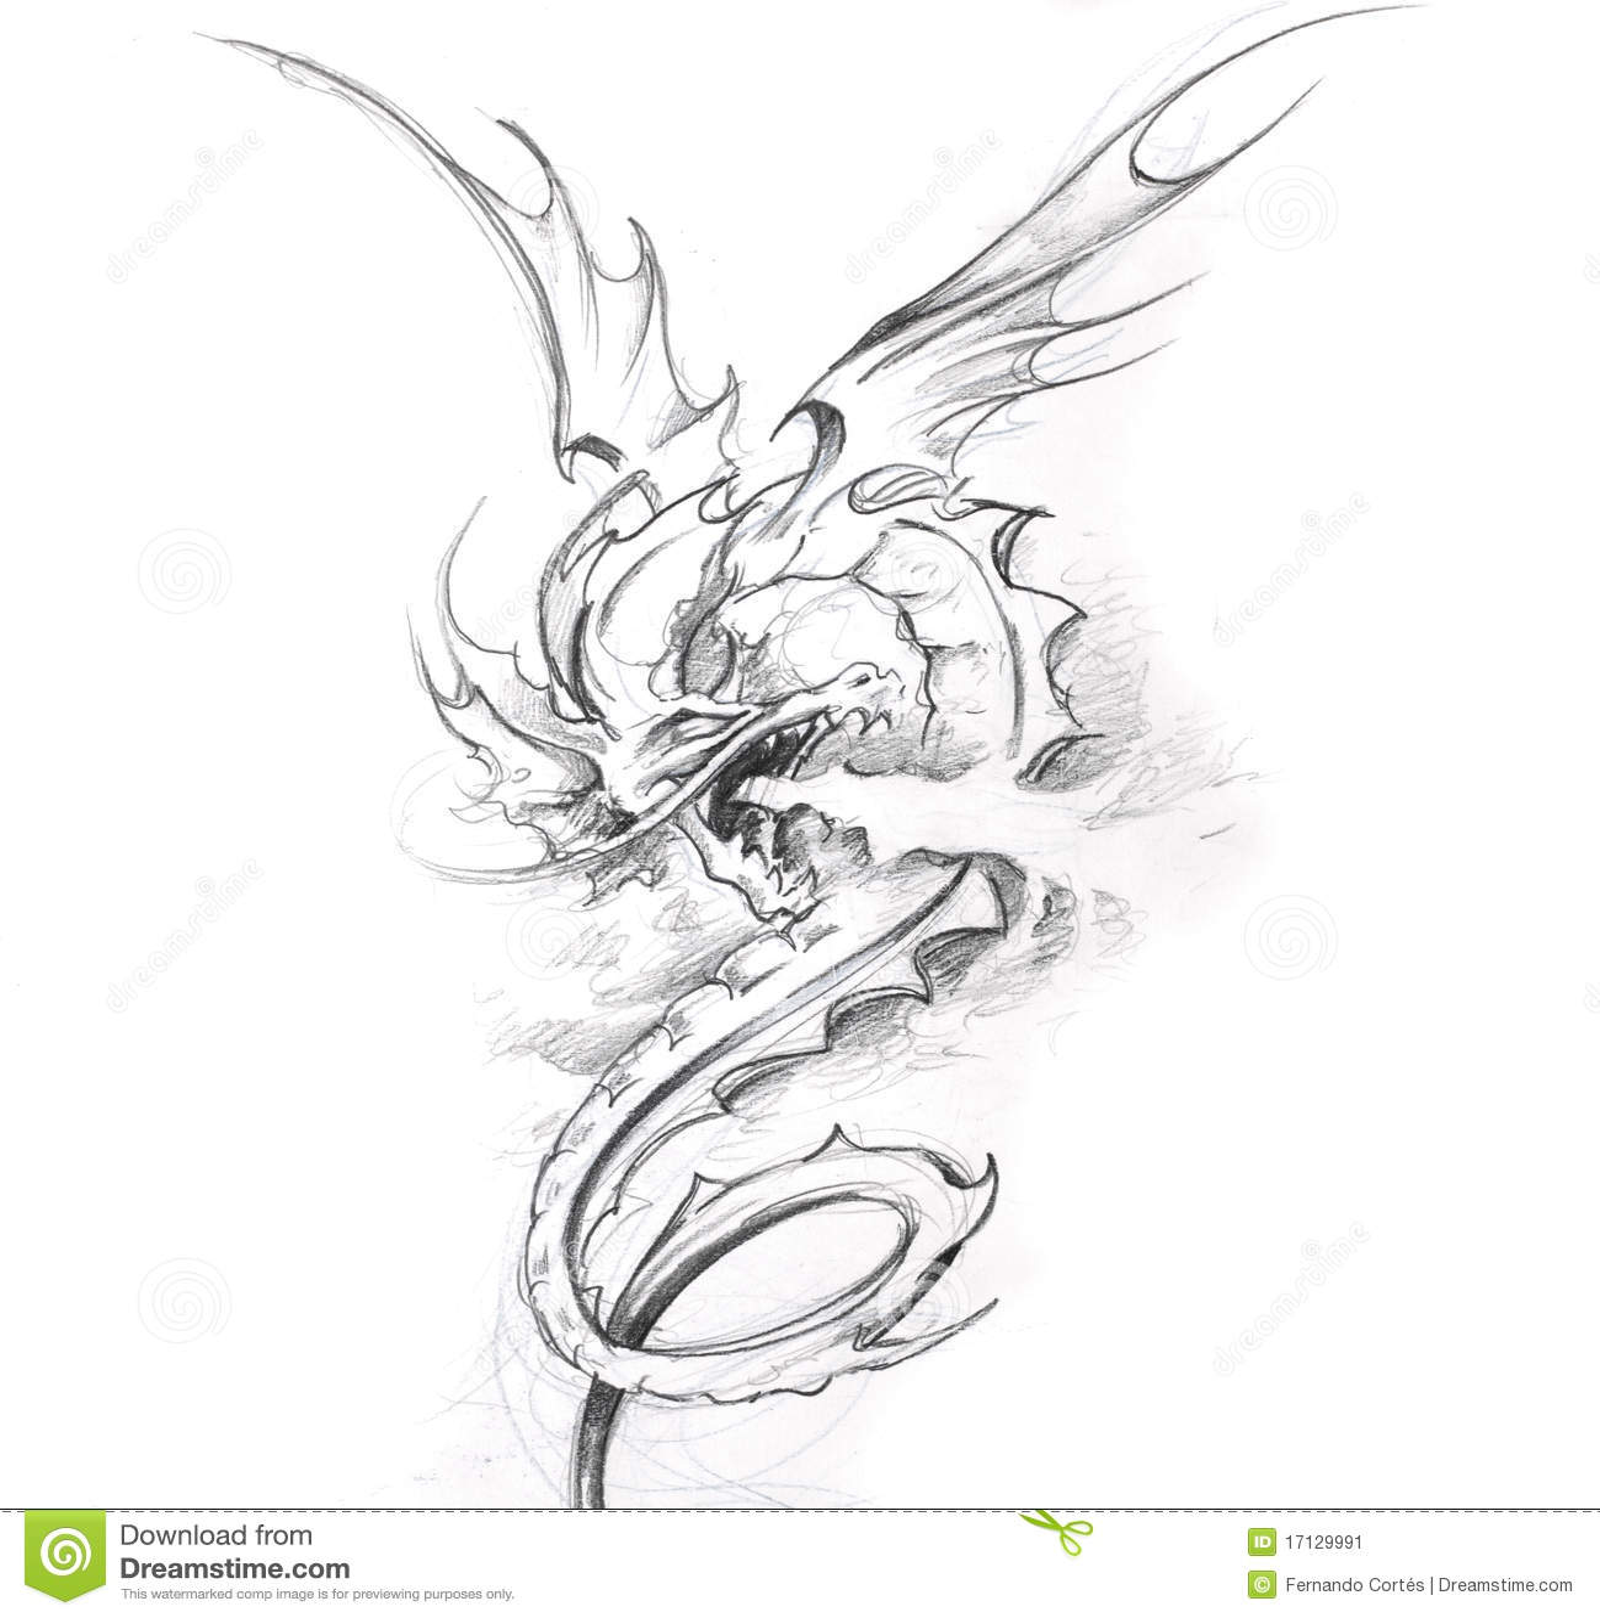 Tattoo Art Sketch Of A Medieval Dragon Stock Illustration